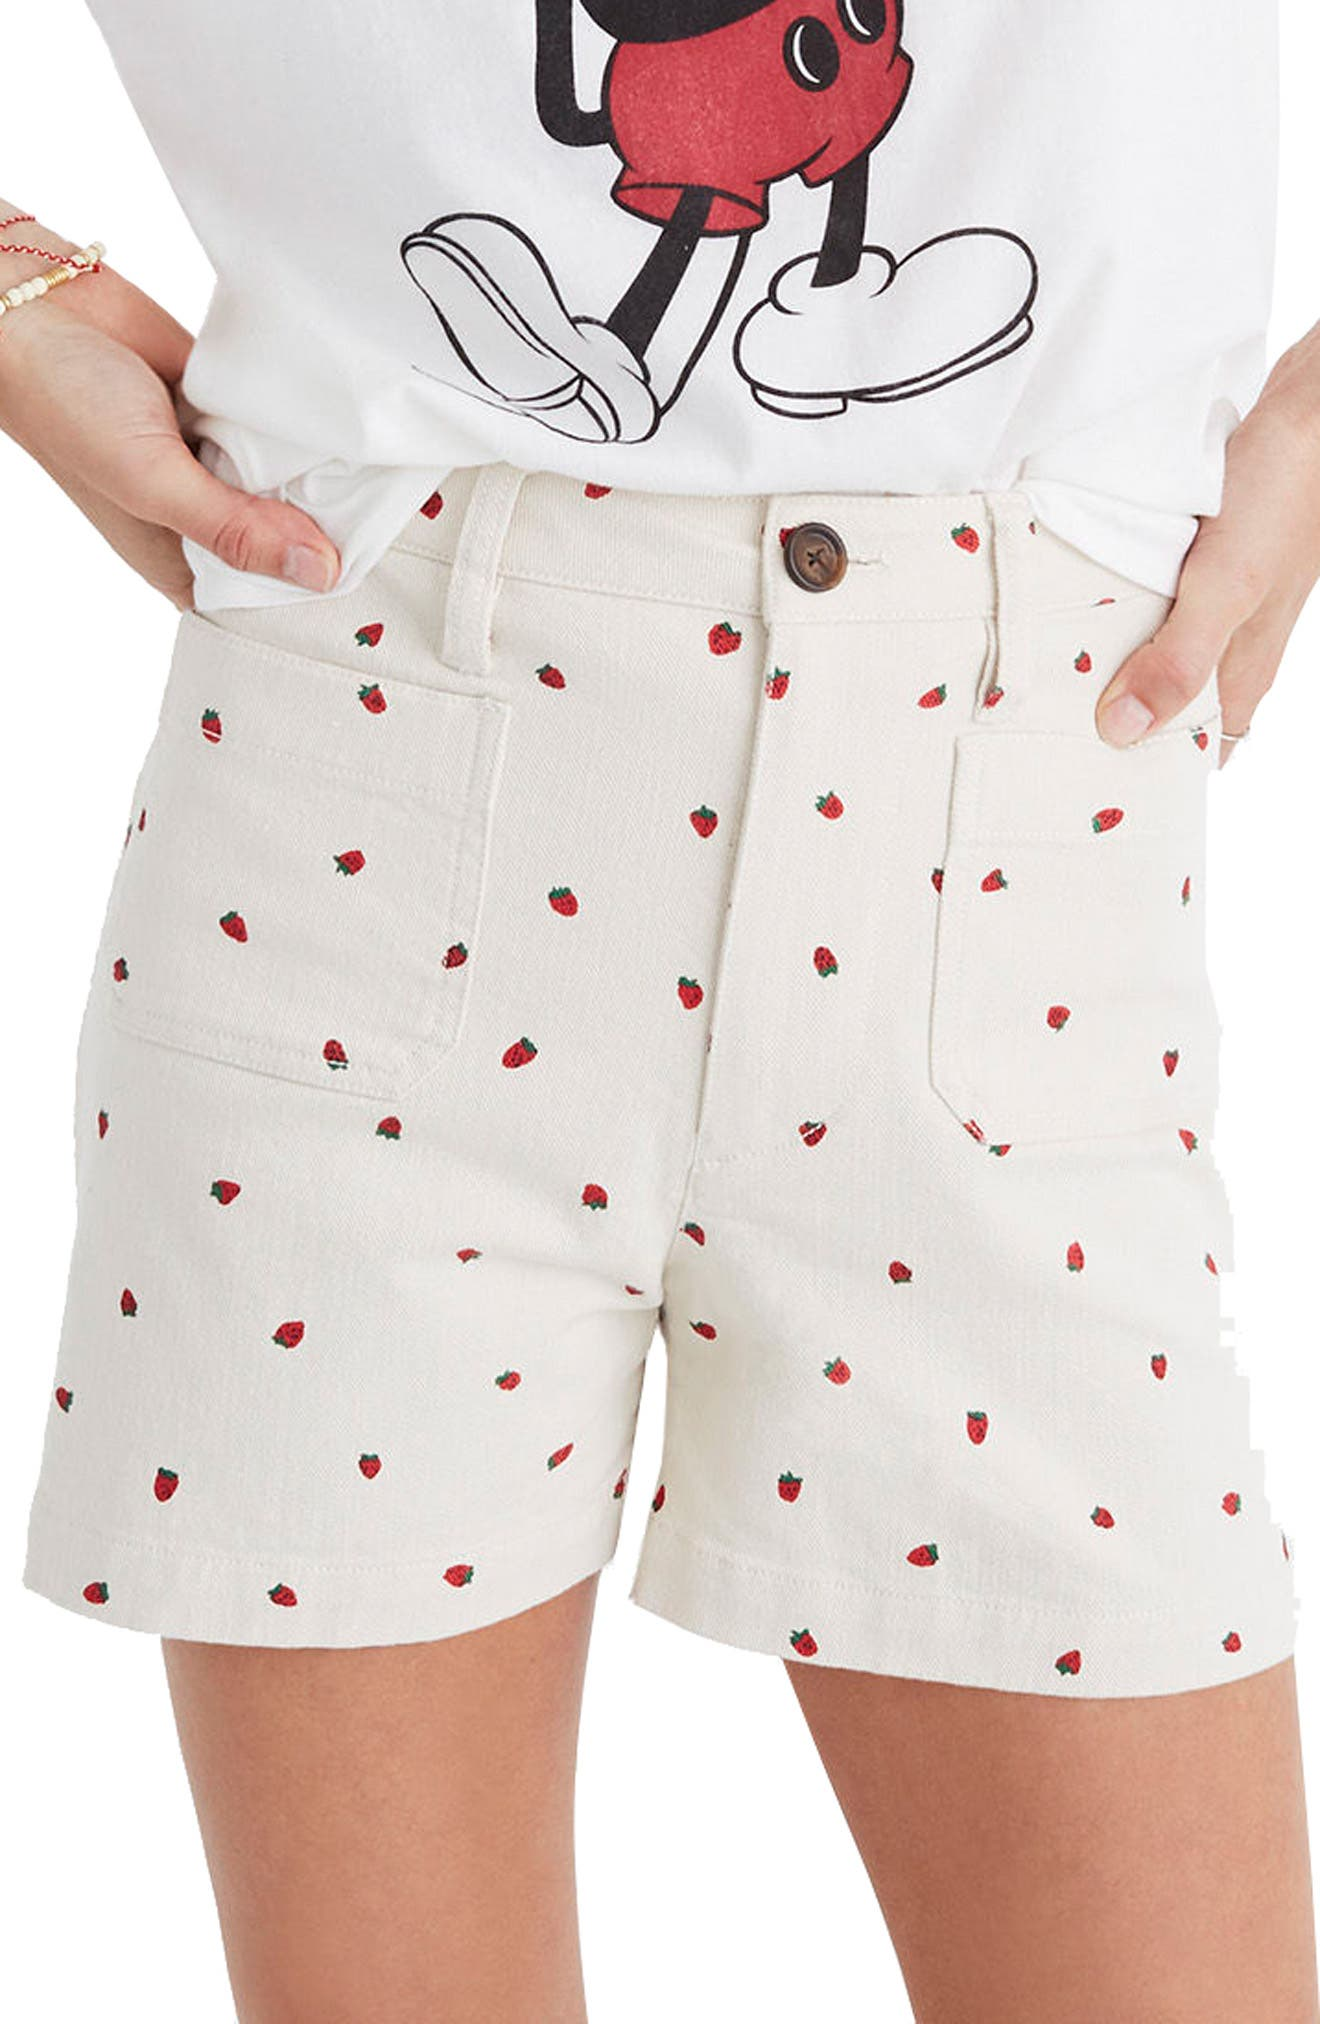 Emmett Fresh Strawberries Shorts,                         Main,                         color, Strawberry Distressed Stone